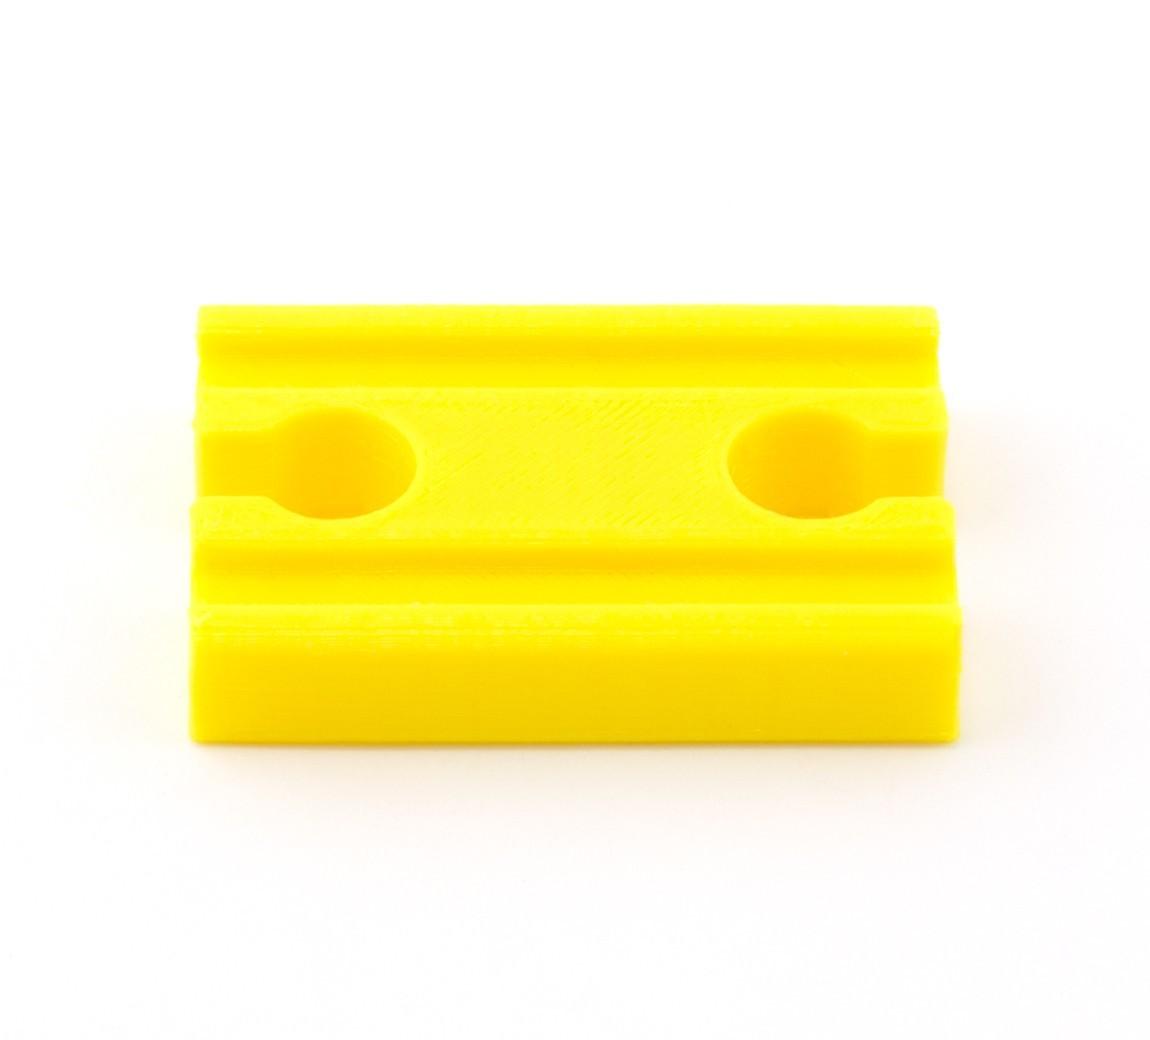 91cb4f62ceb4627f4039d91b0e40adb8_1449686743385_12.2.15-product-shoot-204.jpg Download free STL file Toy Train Tracks • 3D printer design, FerryTeacher